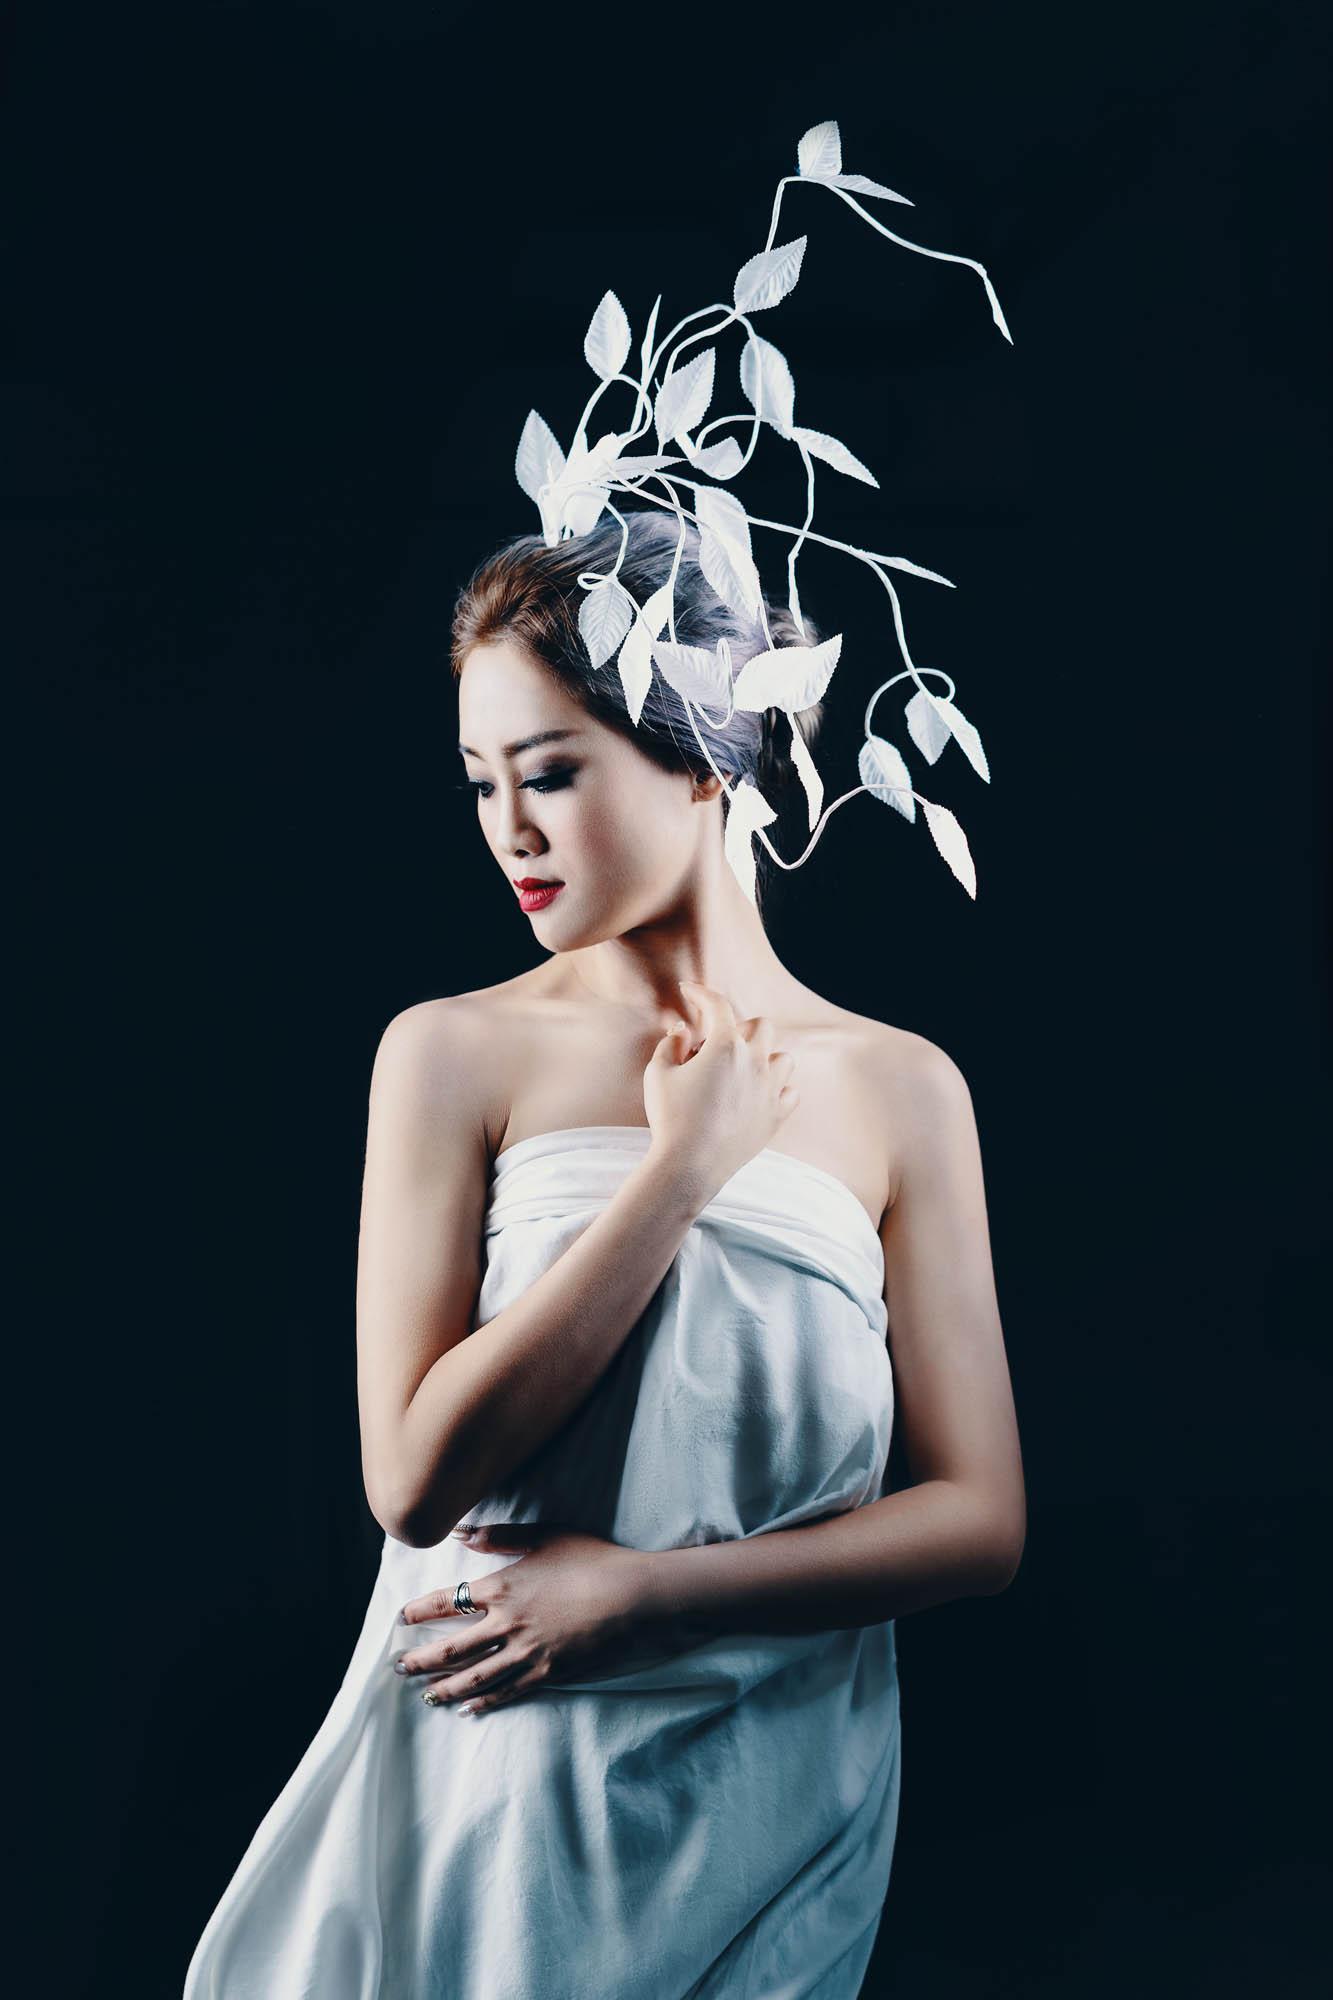 Lex & Josh Abstract Fashion Headpiece Portrait Shoot-3.jpg